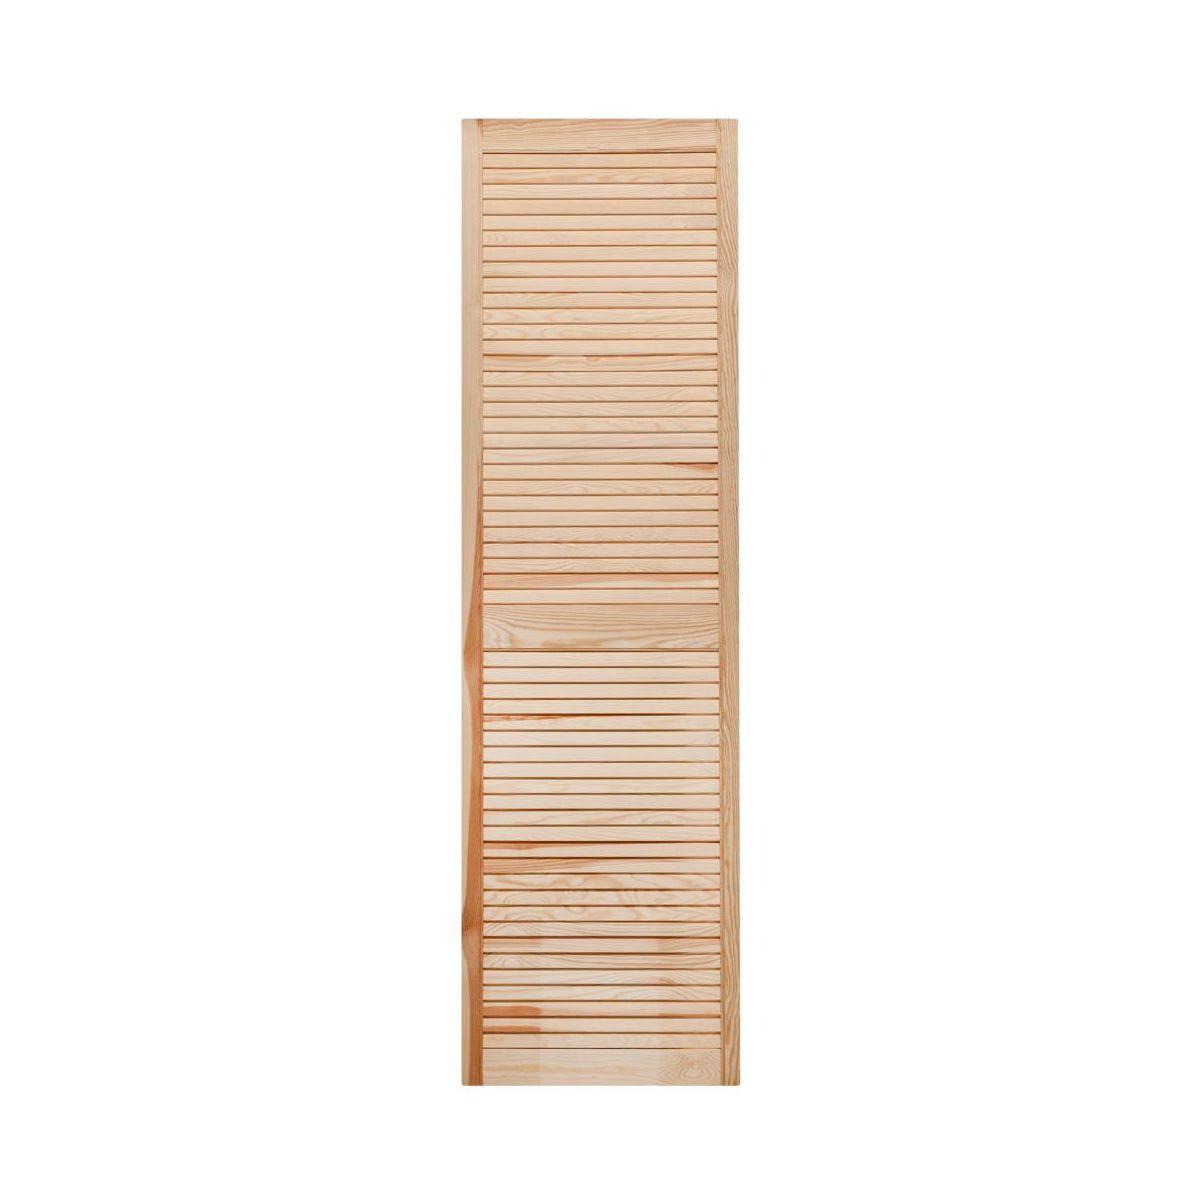 Openwork dvere 39,4 cm x 242,2 cm, predné, drevo